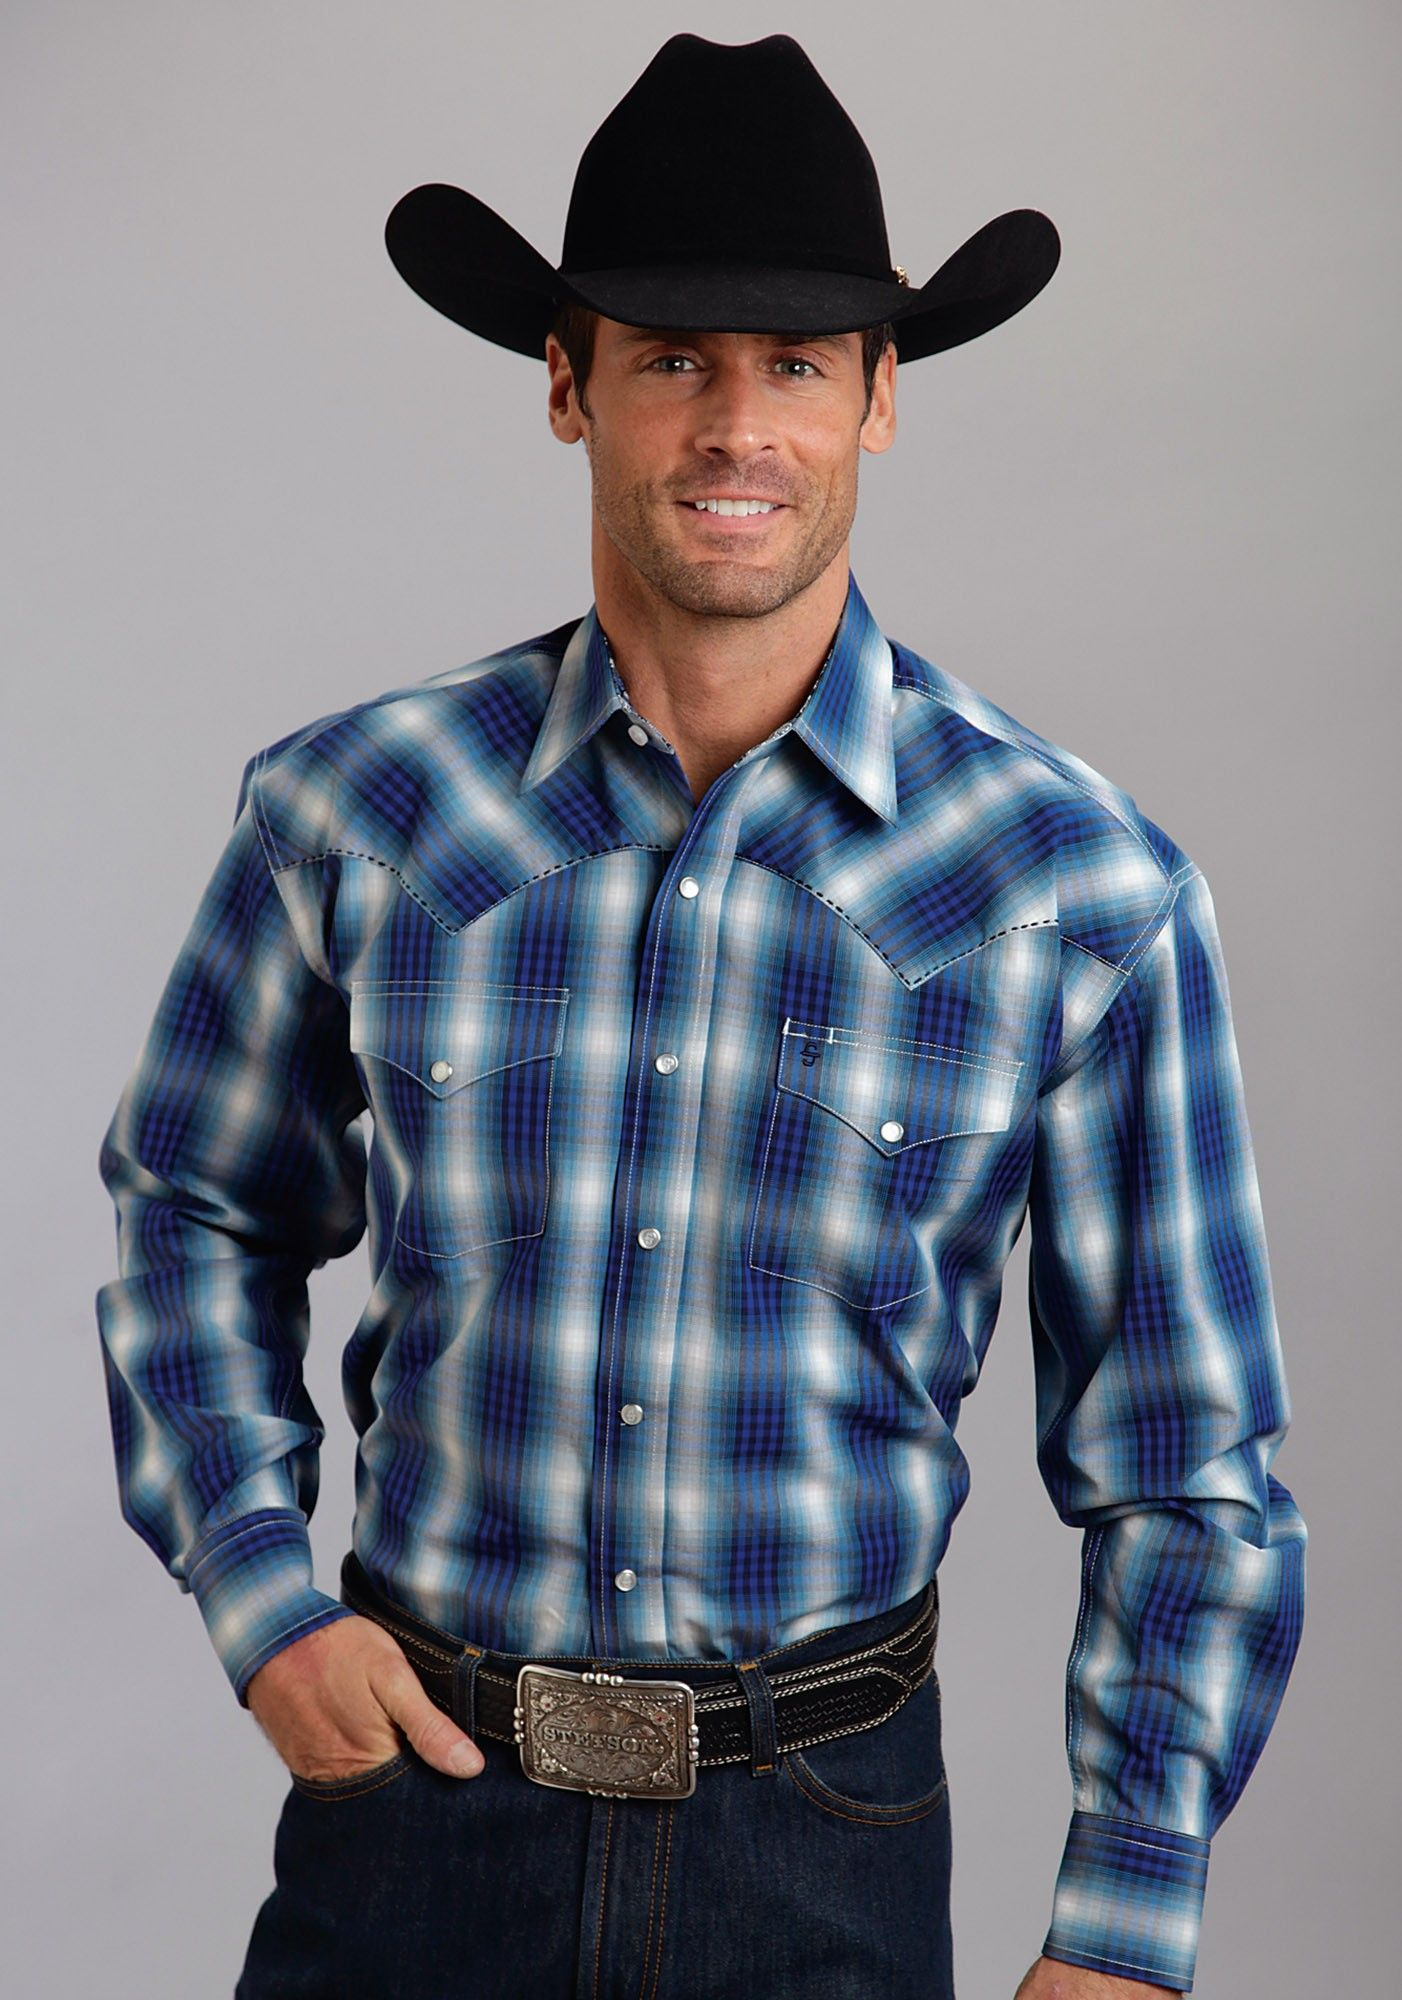 Stetson Mens Cowboy Shirt  Cripple Creek  Rock Wear in